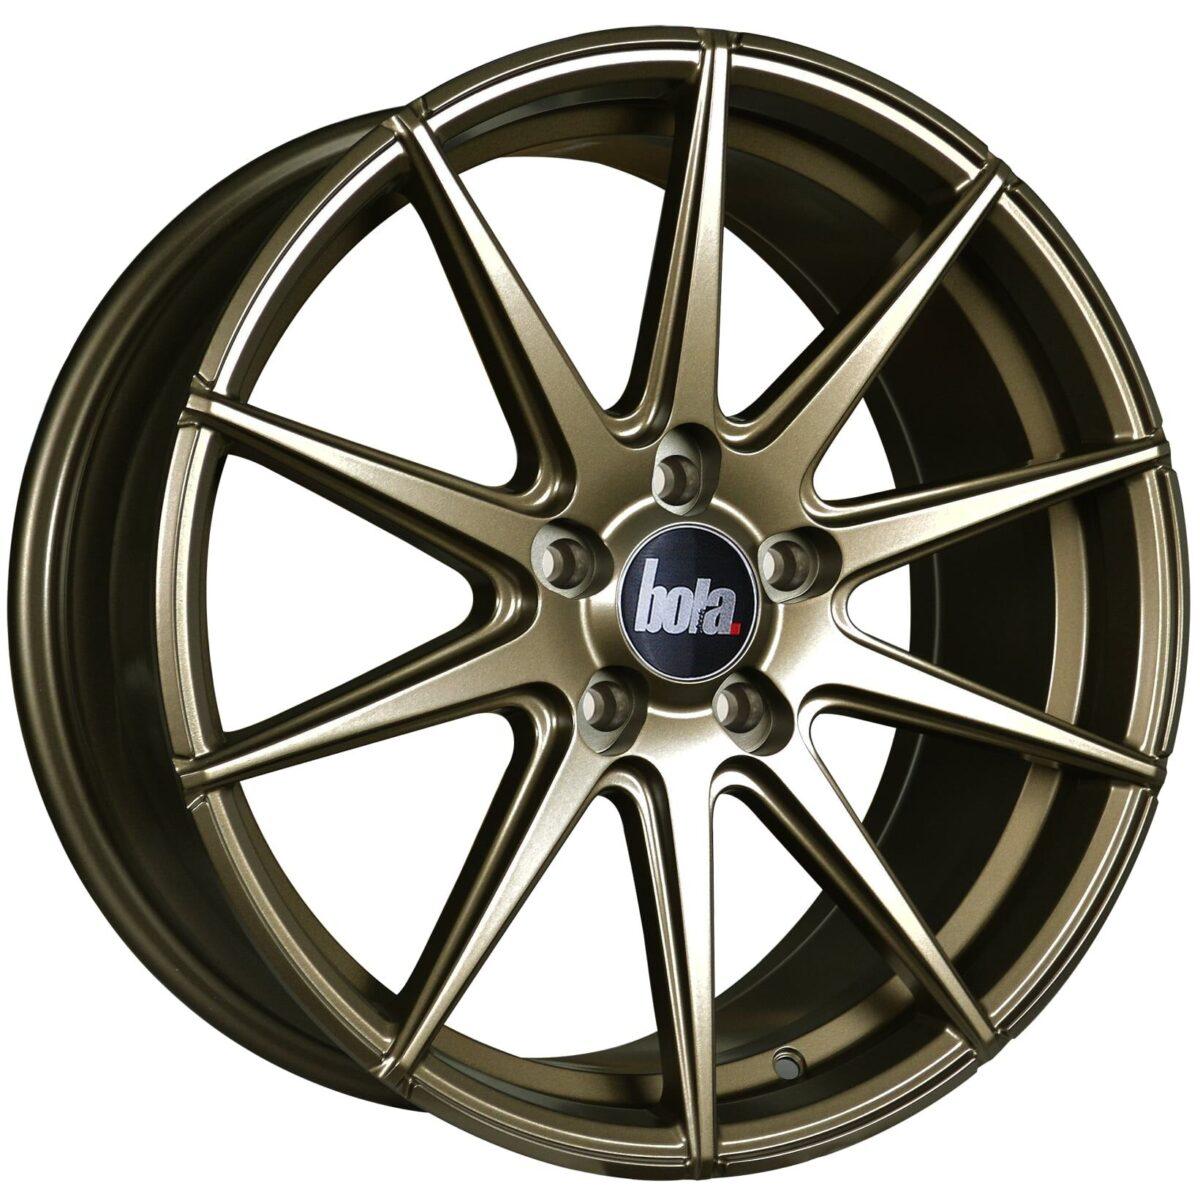 "18"" BOLA CSR Wheels - Matt Bronze - All BMW Models"